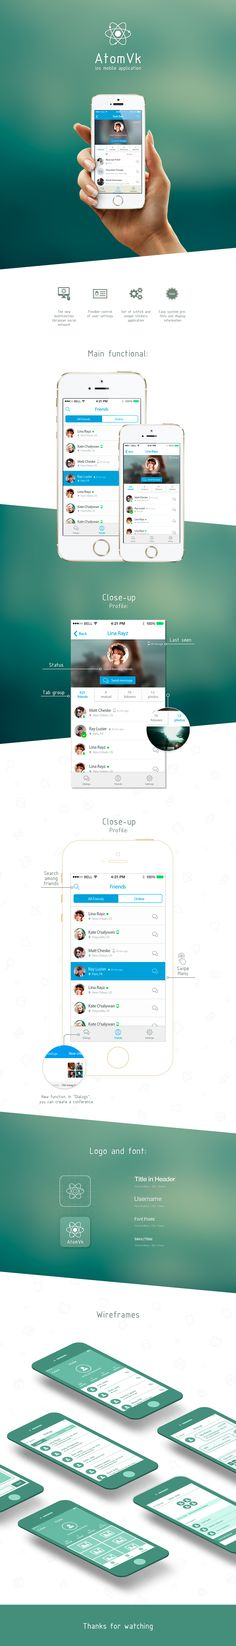 New social network for iOS - Atomvk https://itunes.apple.com/ru/app/atom-dla-vkontakte/id882536208?mt=8